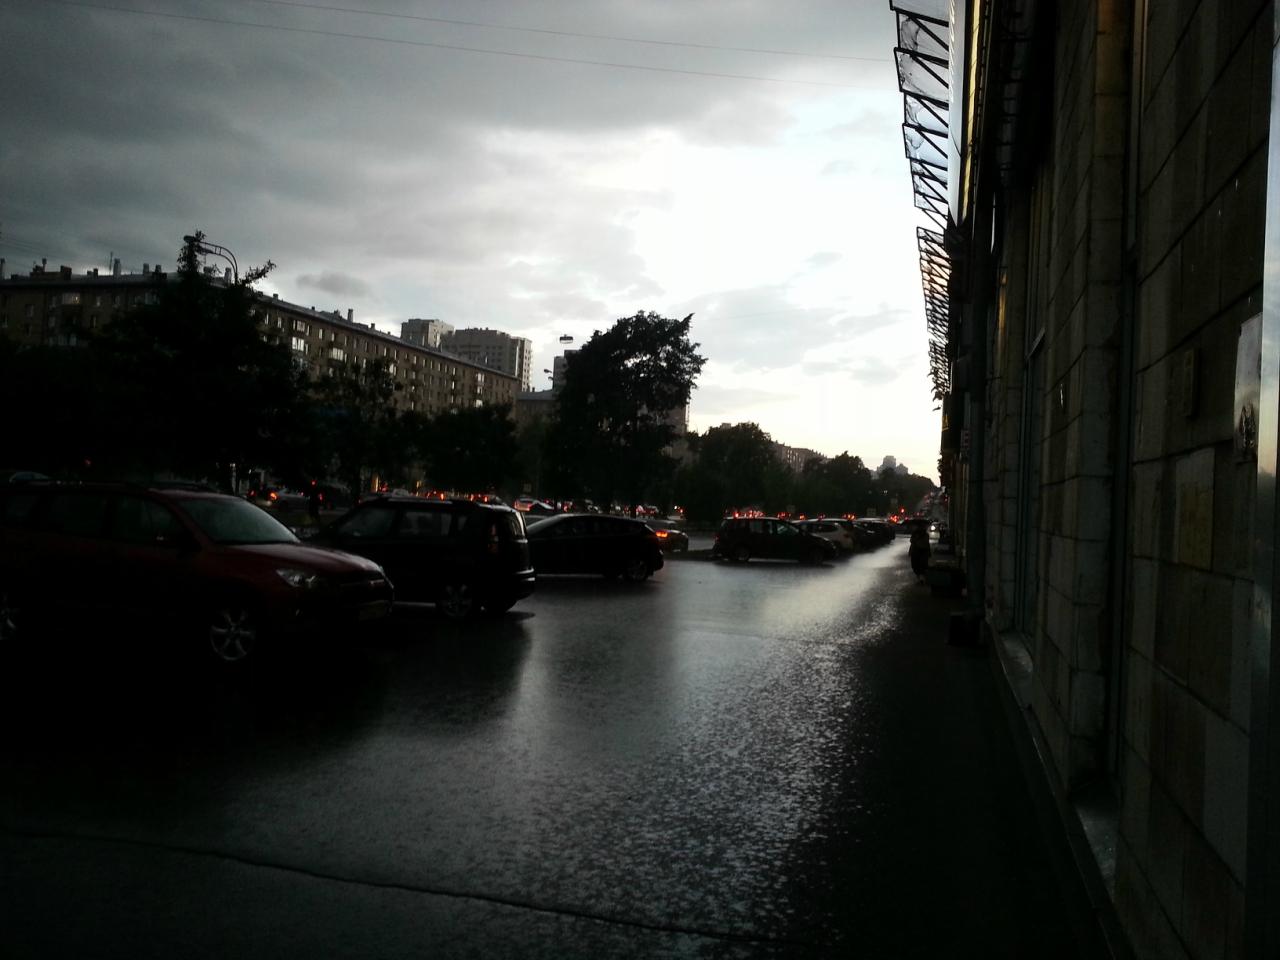 http://img-fotki.yandex.ru/get/4704/230932904.1db/0_f737e_cdc6bcdf_orig